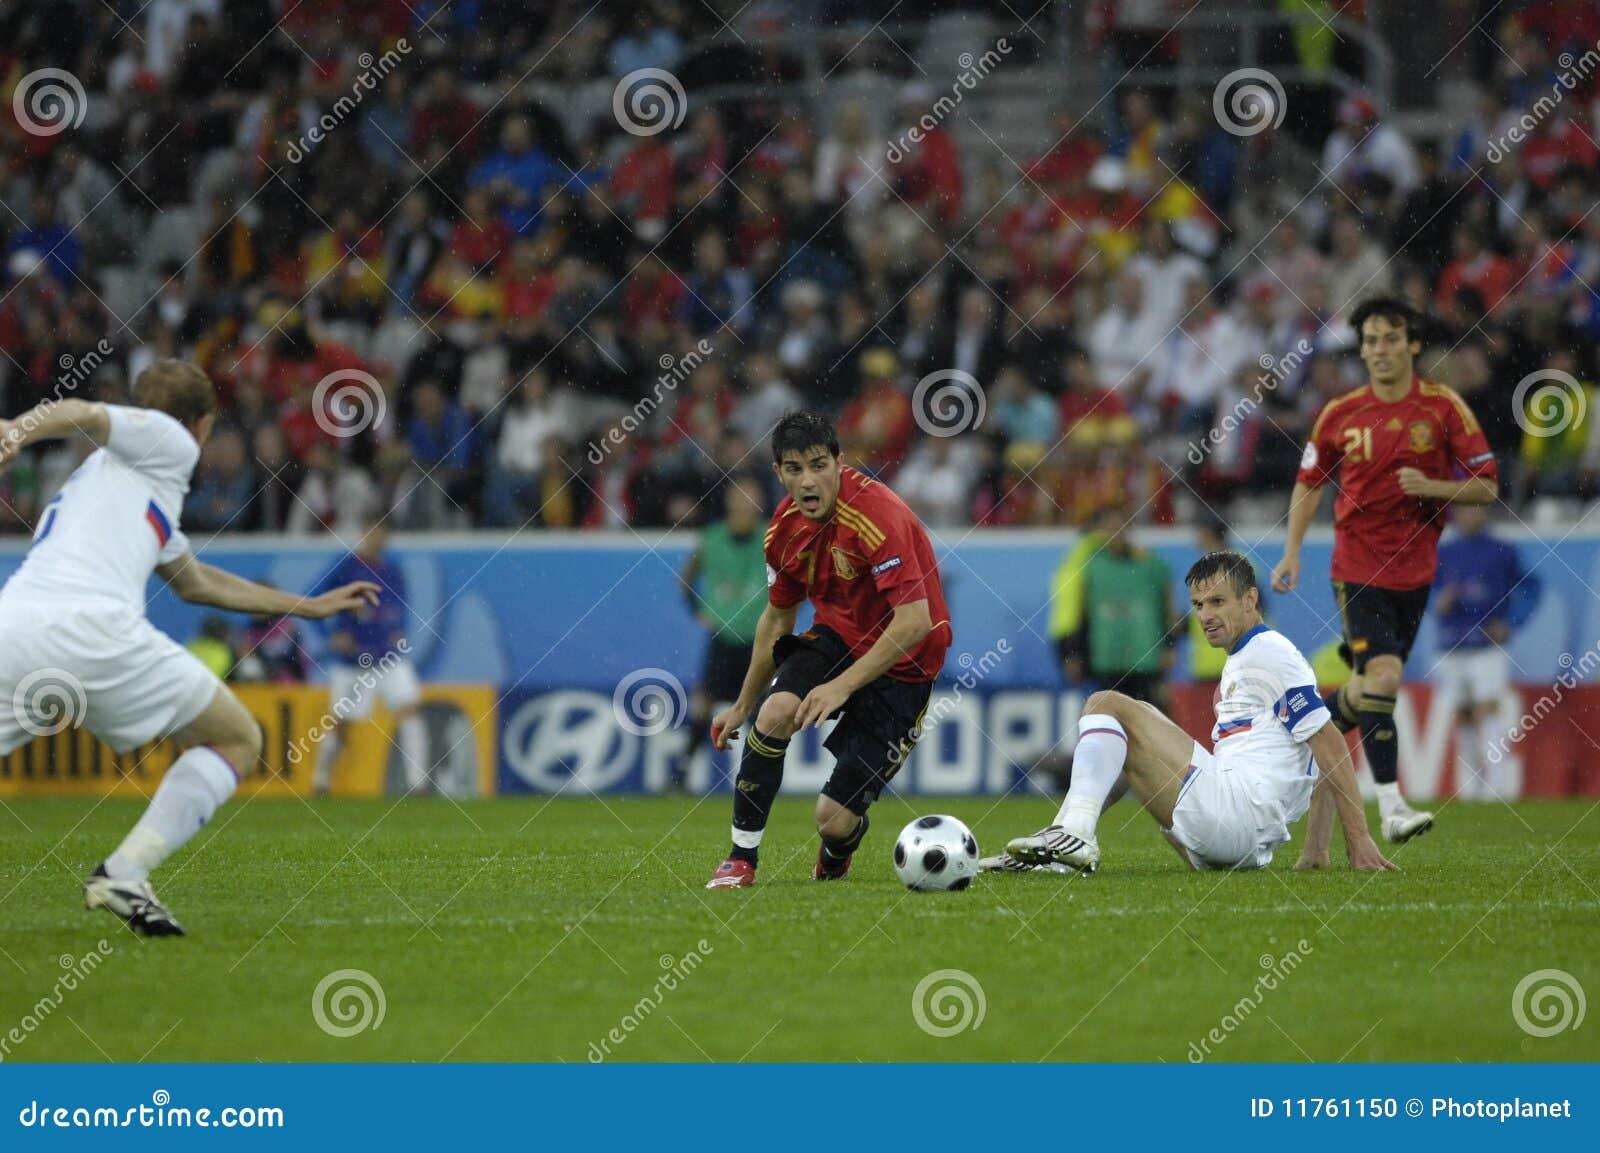 FranceFootball 2009 Best 30Players David Villa